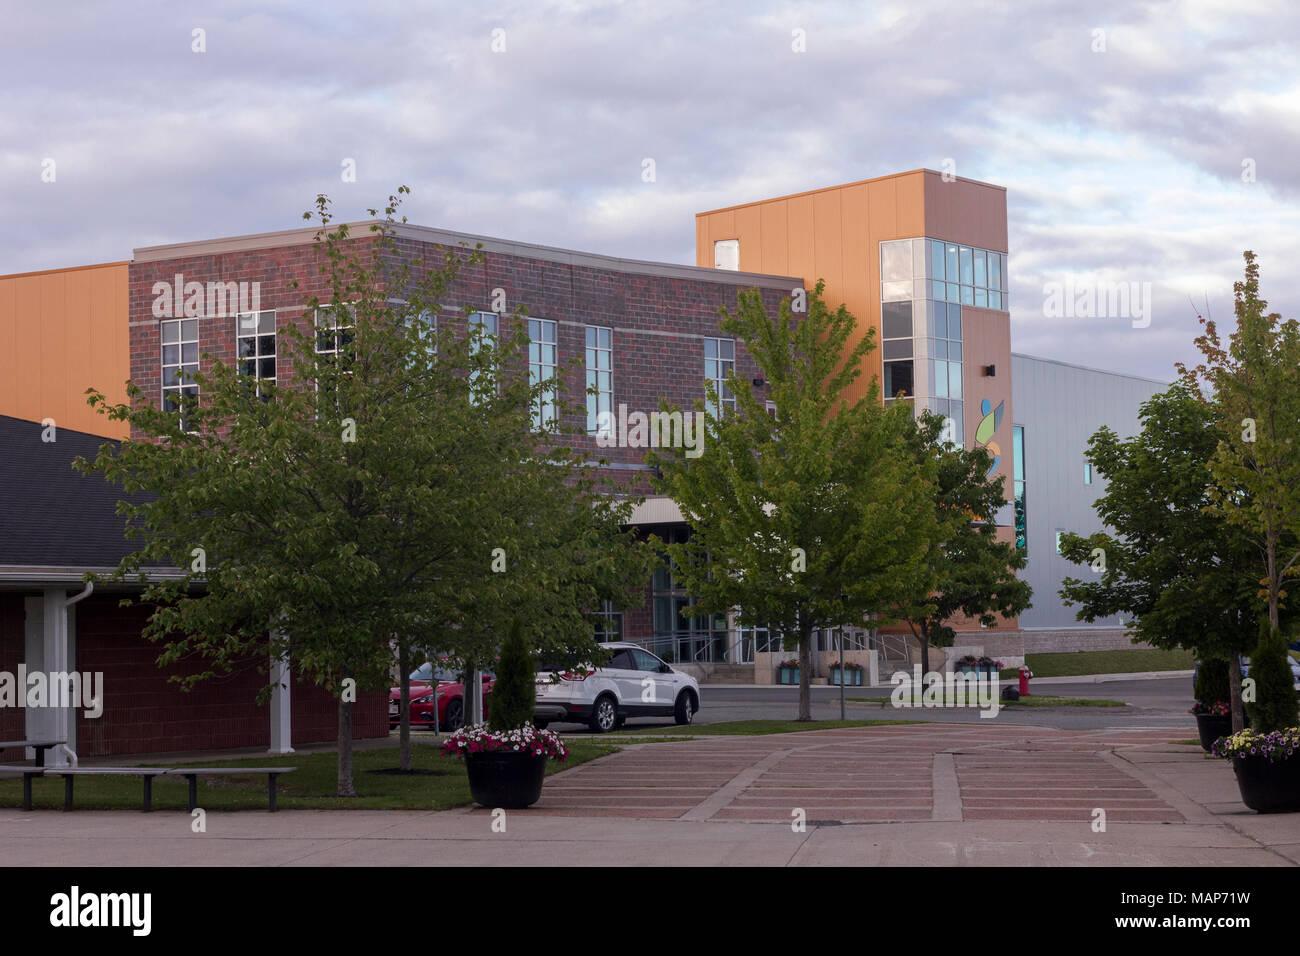 View of the multi-purpose sporting facility, the Garcelon Civic Centre in St. Stephen, New Brunswick, Canada - Stock Image